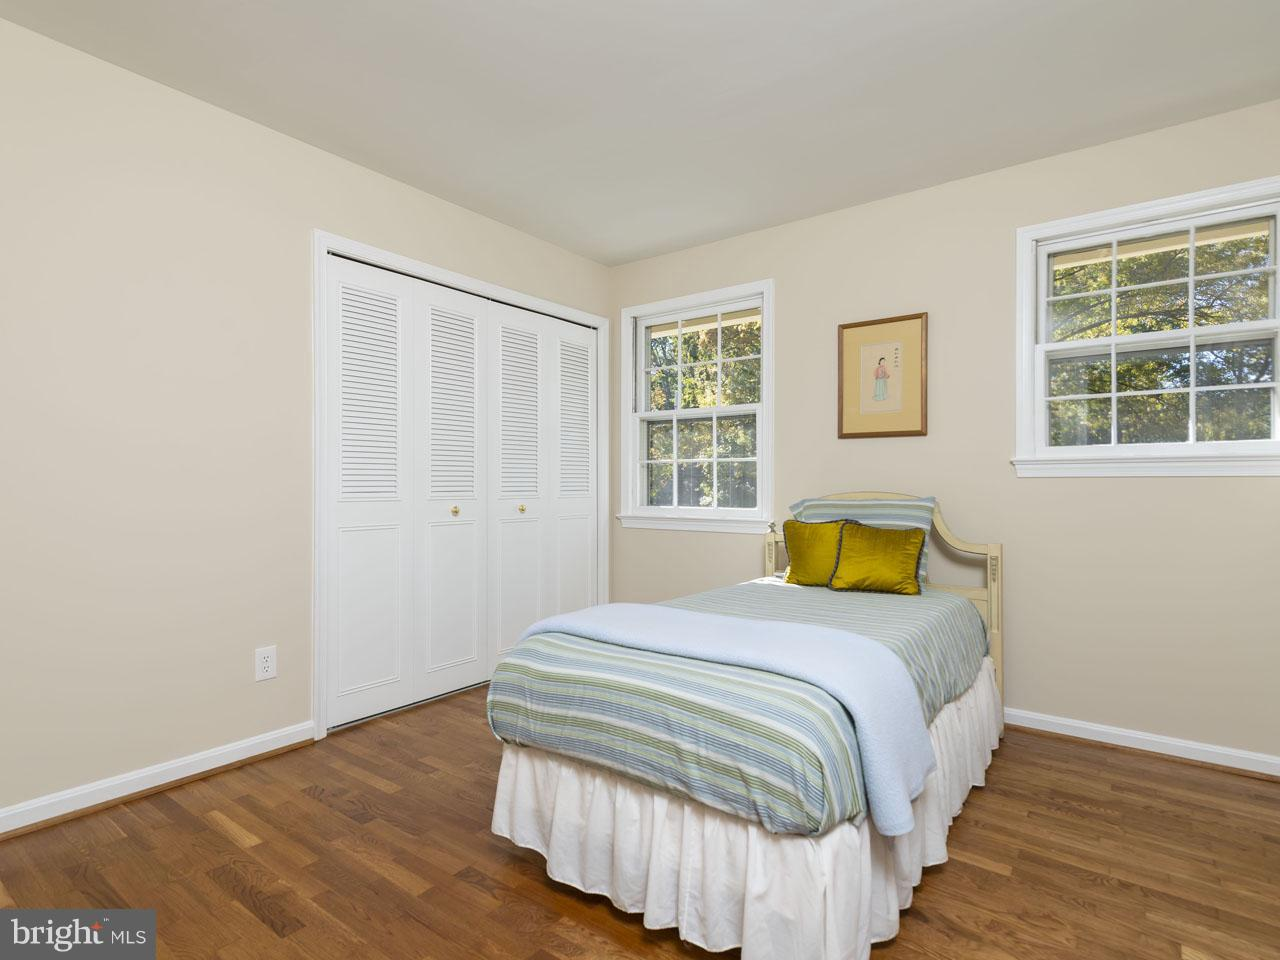 1010014728-300953035347-2021-09-05-13-50-26  |   | Annandale Delaware Real Estate For Sale | MLS# 1010014728  - Best of Northern Virginia